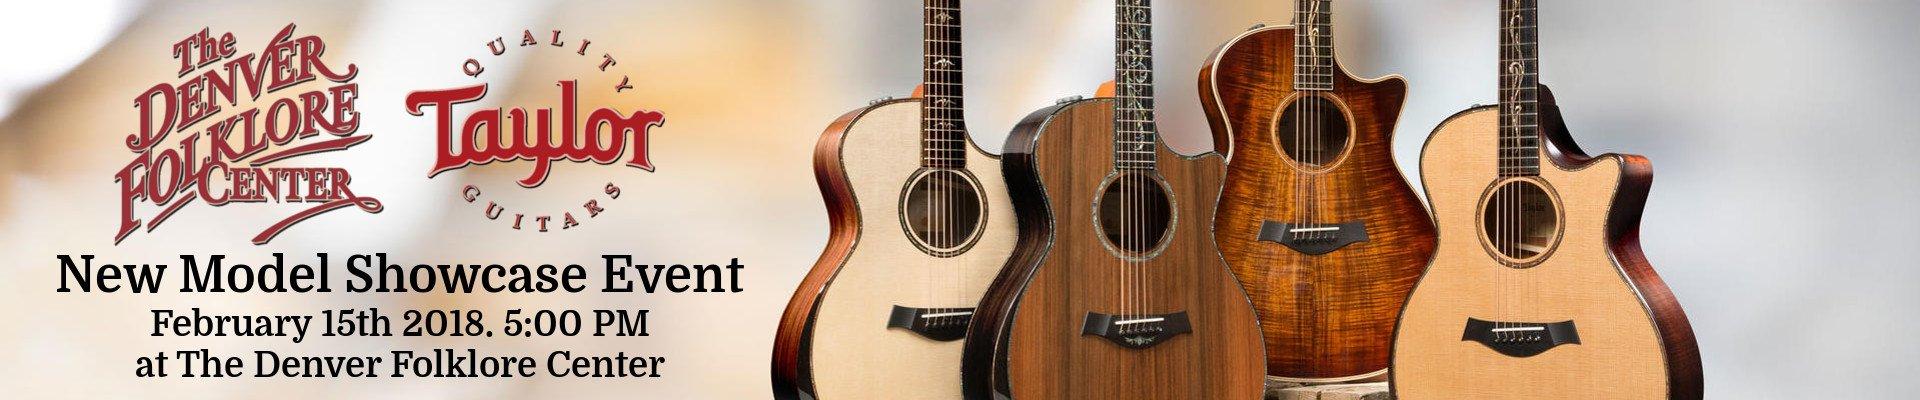 Free guitars giveaways